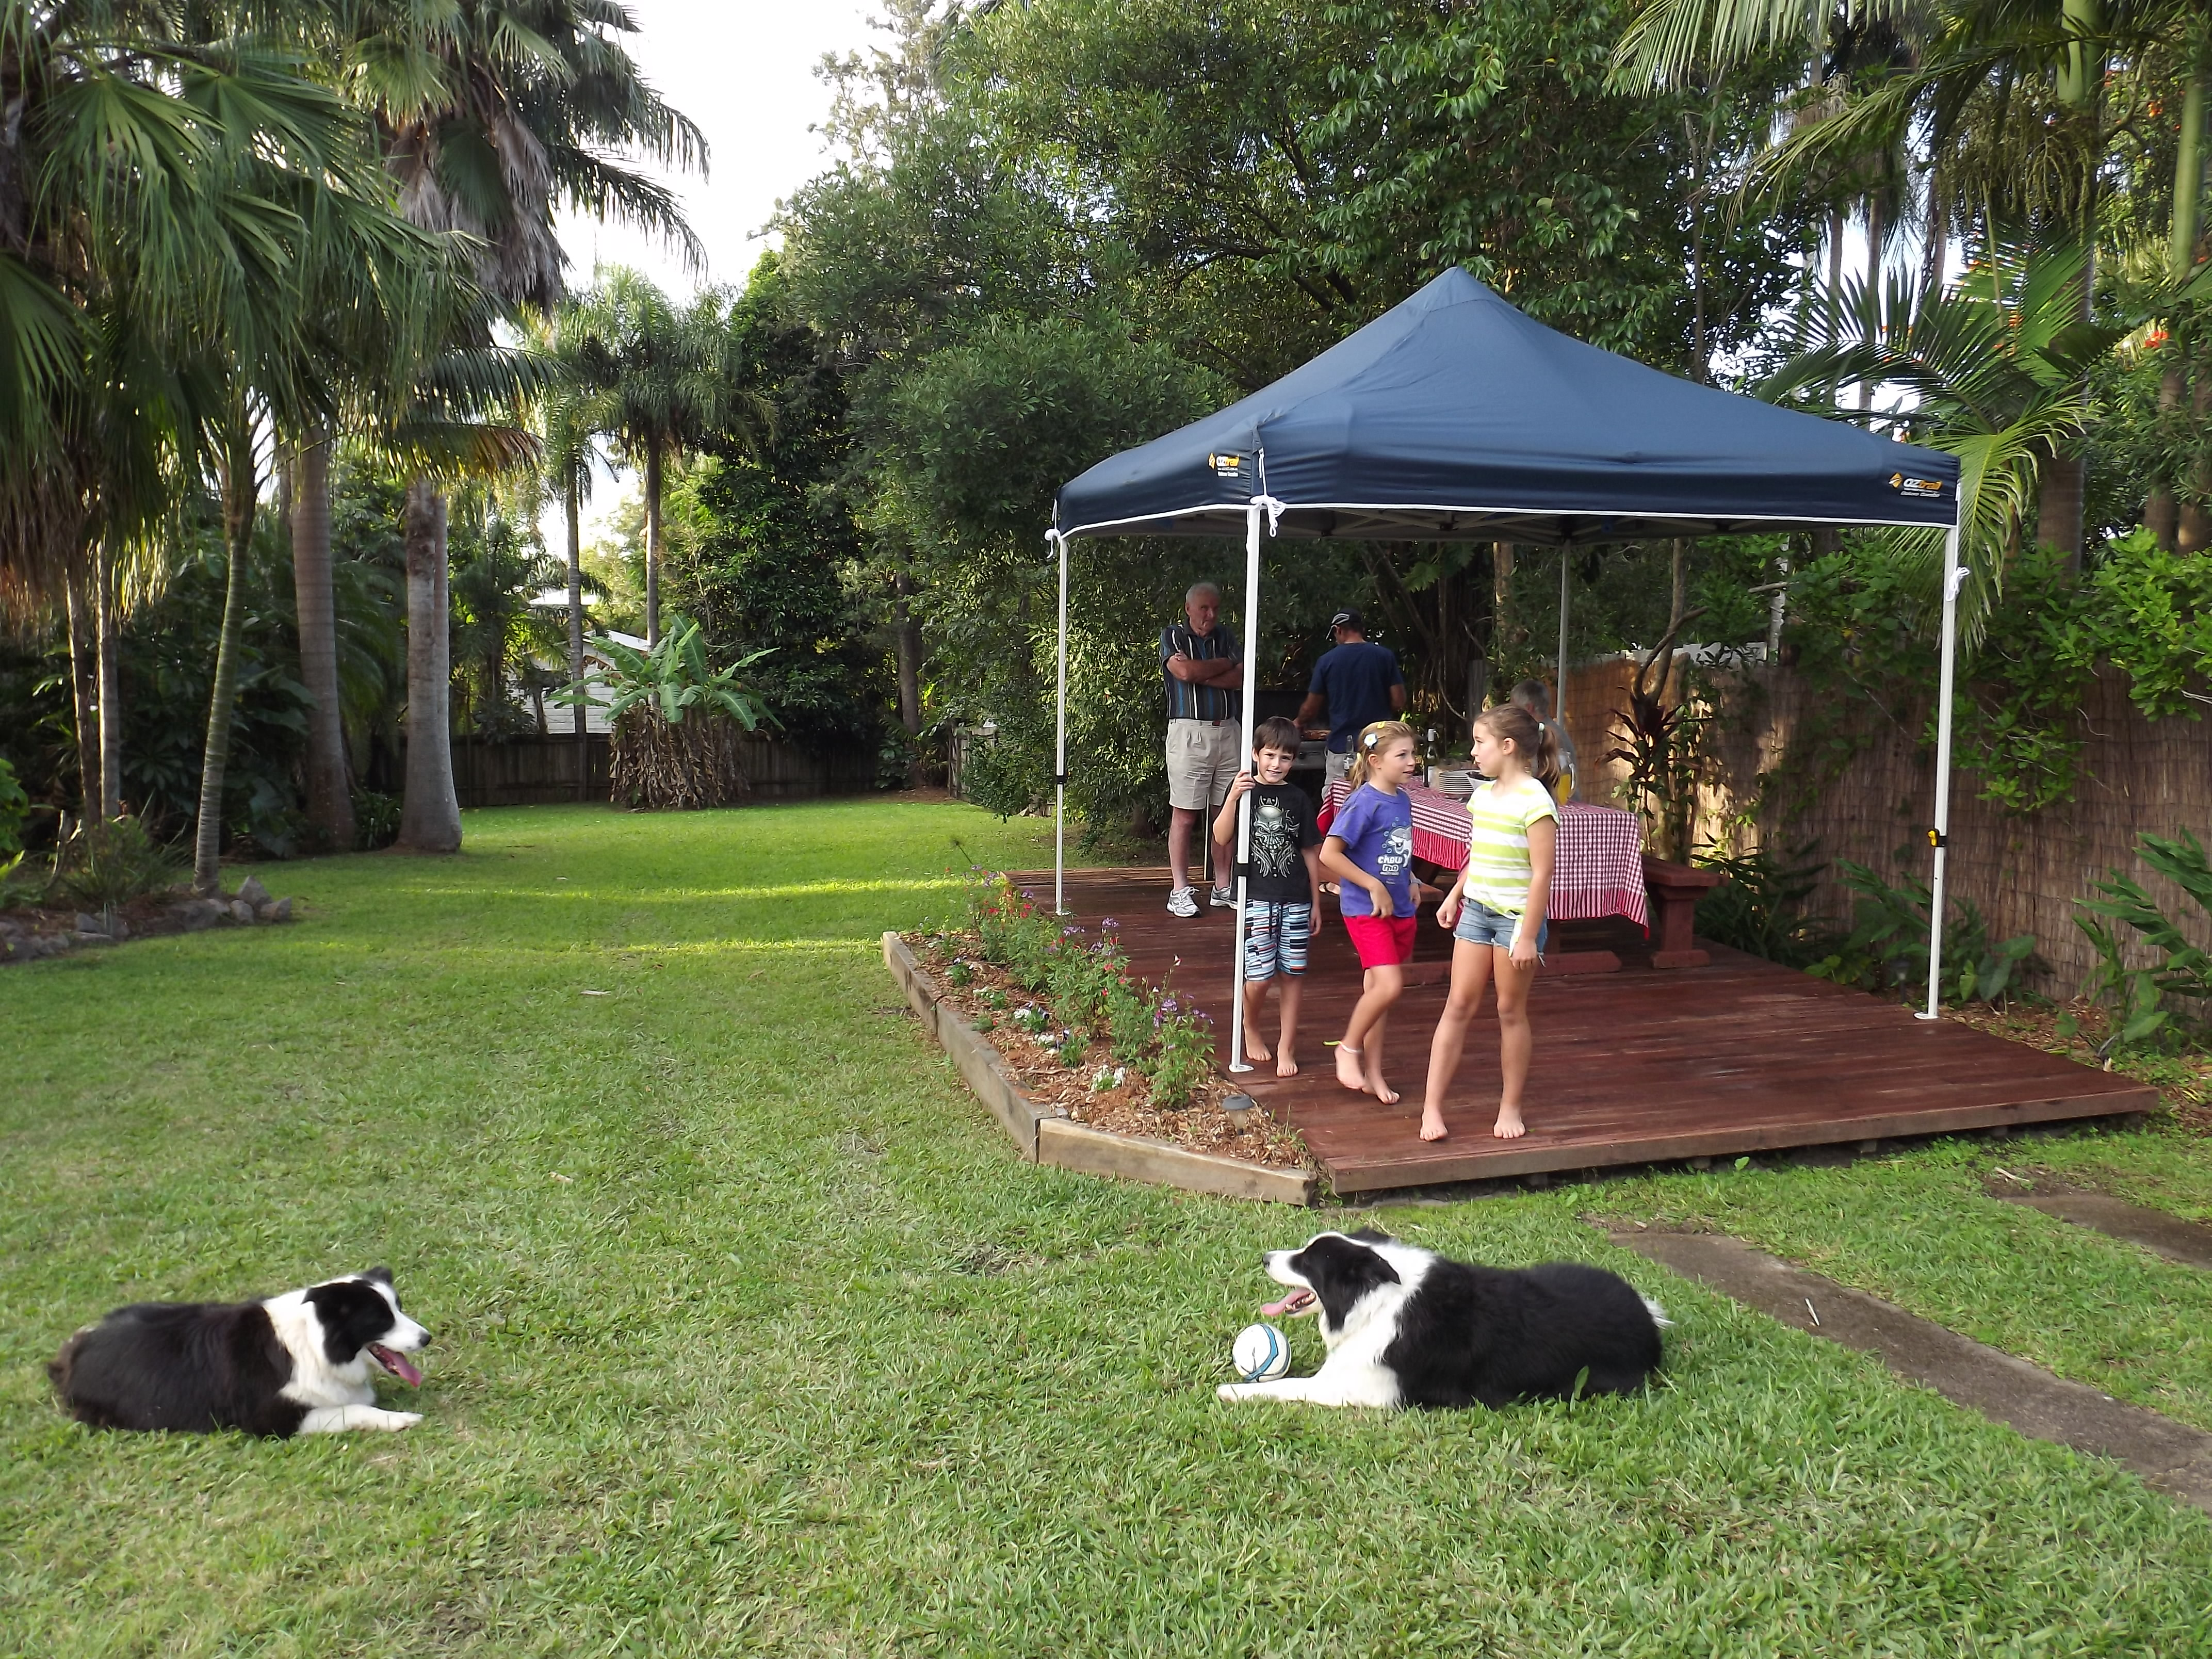 Pet friendly yard gallery image